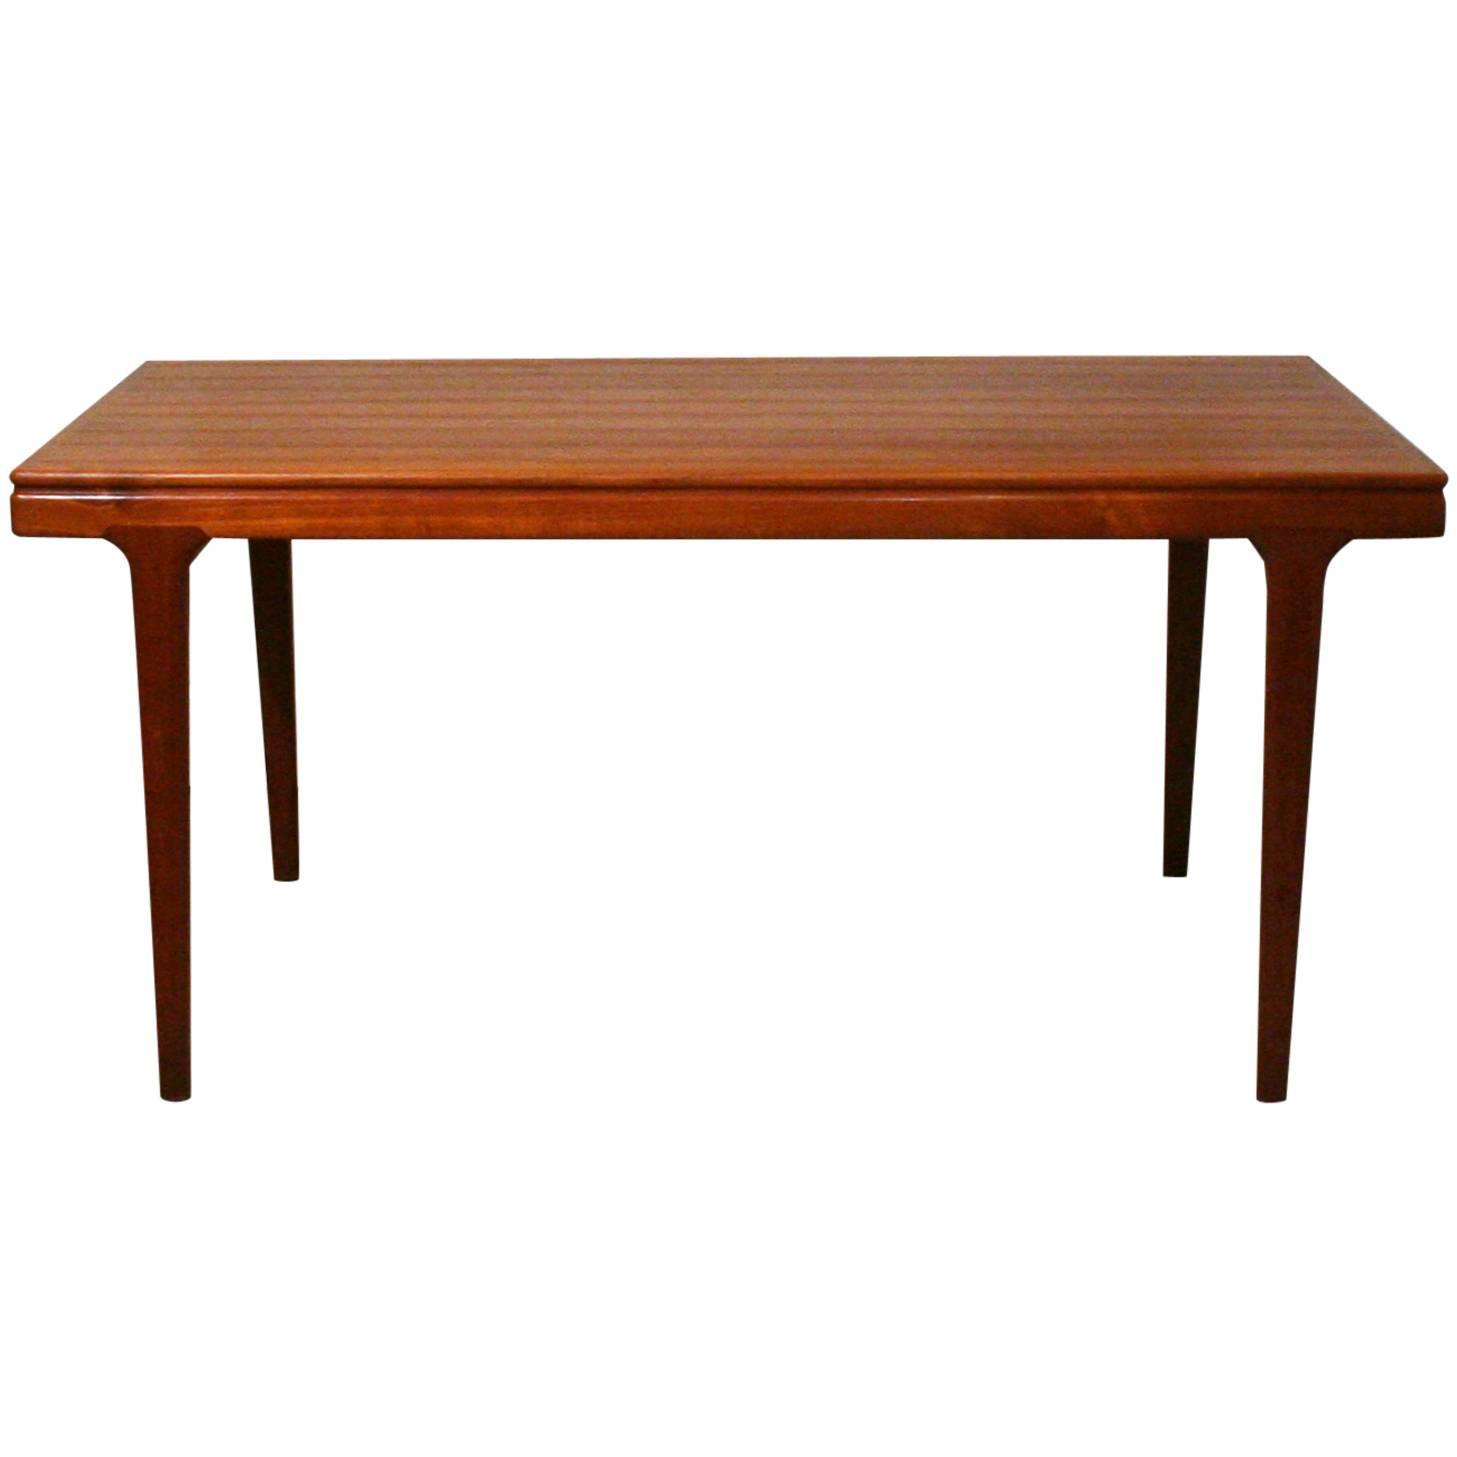 Vintage Danish Teak Dining Table at 1stdibs : 4246833z from www.1stdibs.com size 1457 x 1457 jpeg 46kB